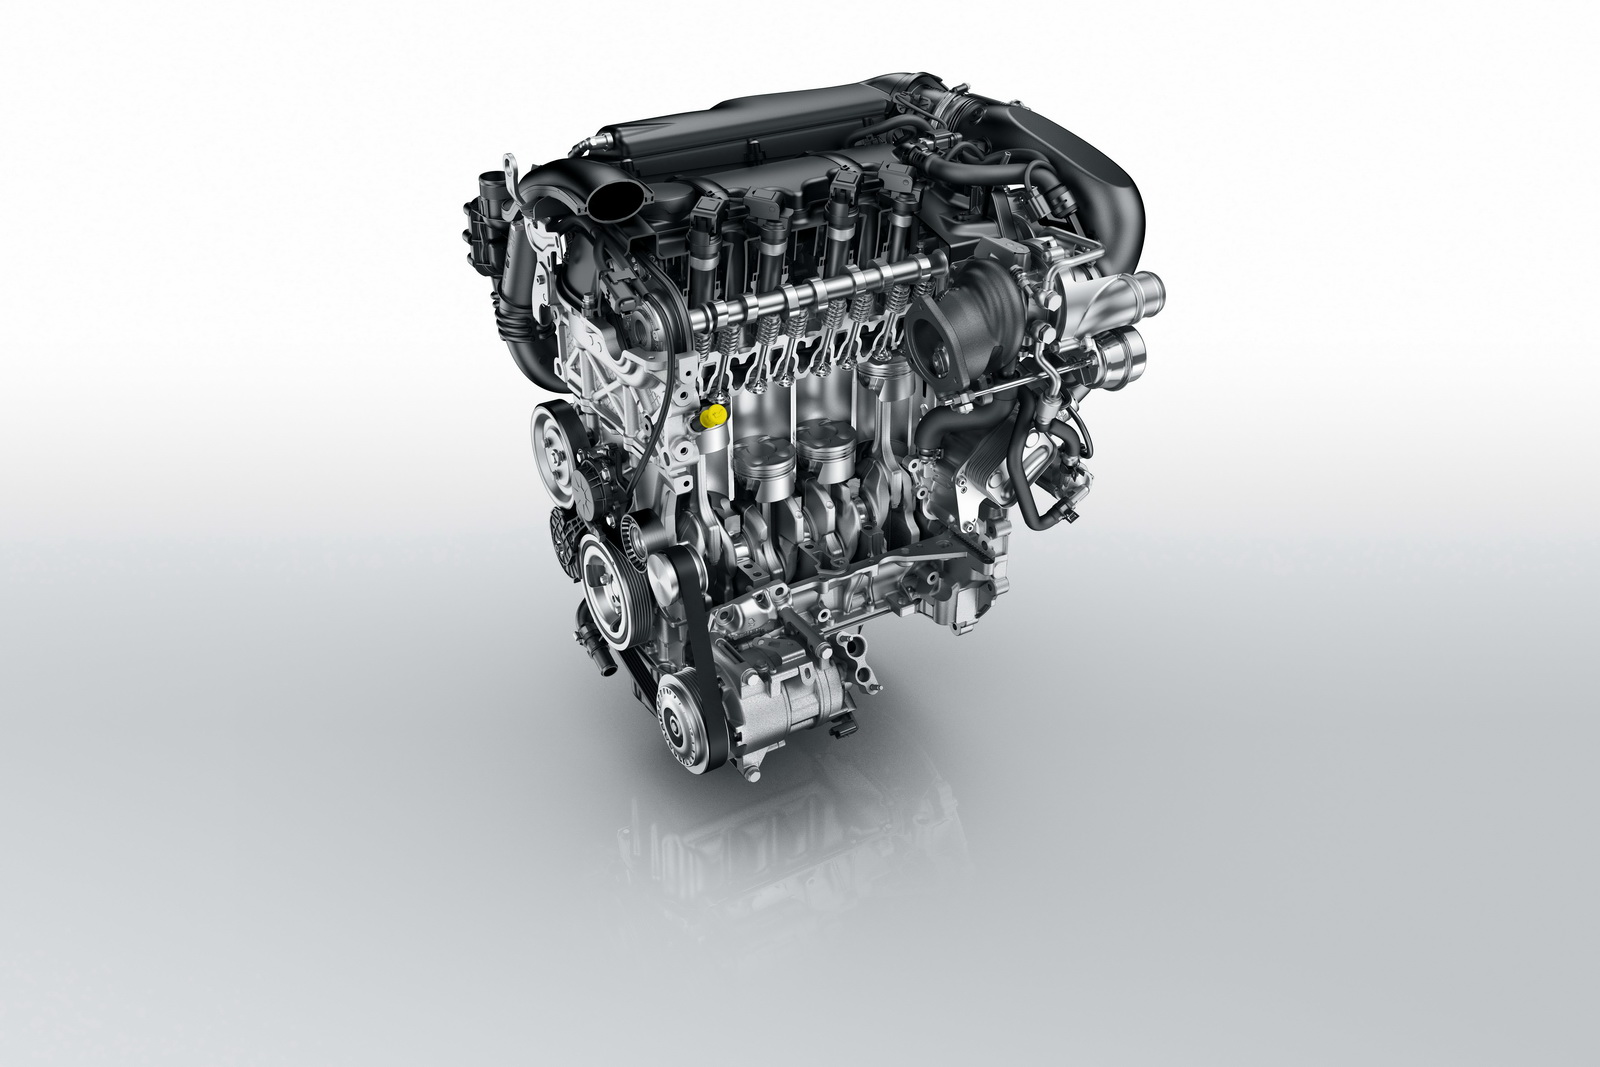 Citroen%2BEngine%2BBlueHDi%2B%25281%2529 H Citroen κάνει ακόμη ένα βήμα μπροστά με τη νέα γενιά κινητήρων Euro 6 citroen, Engine